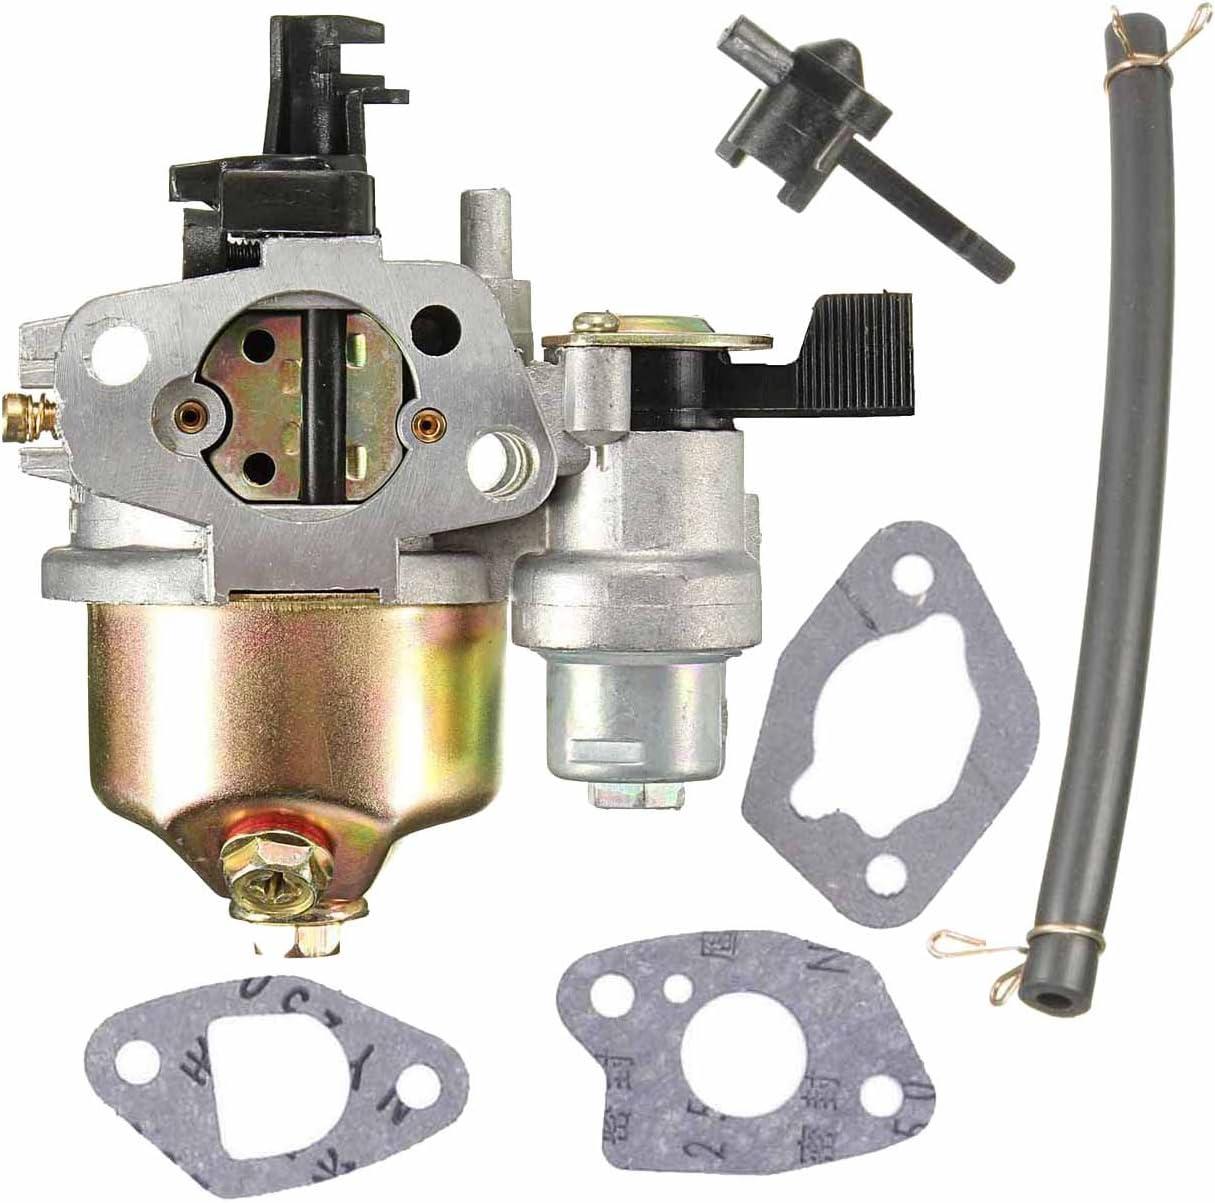 honda gx120 engine diagram amazon com fyiyi new gx120 carburetor for honda gx120 gx140 gx160  honda gx120 gx140 gx160